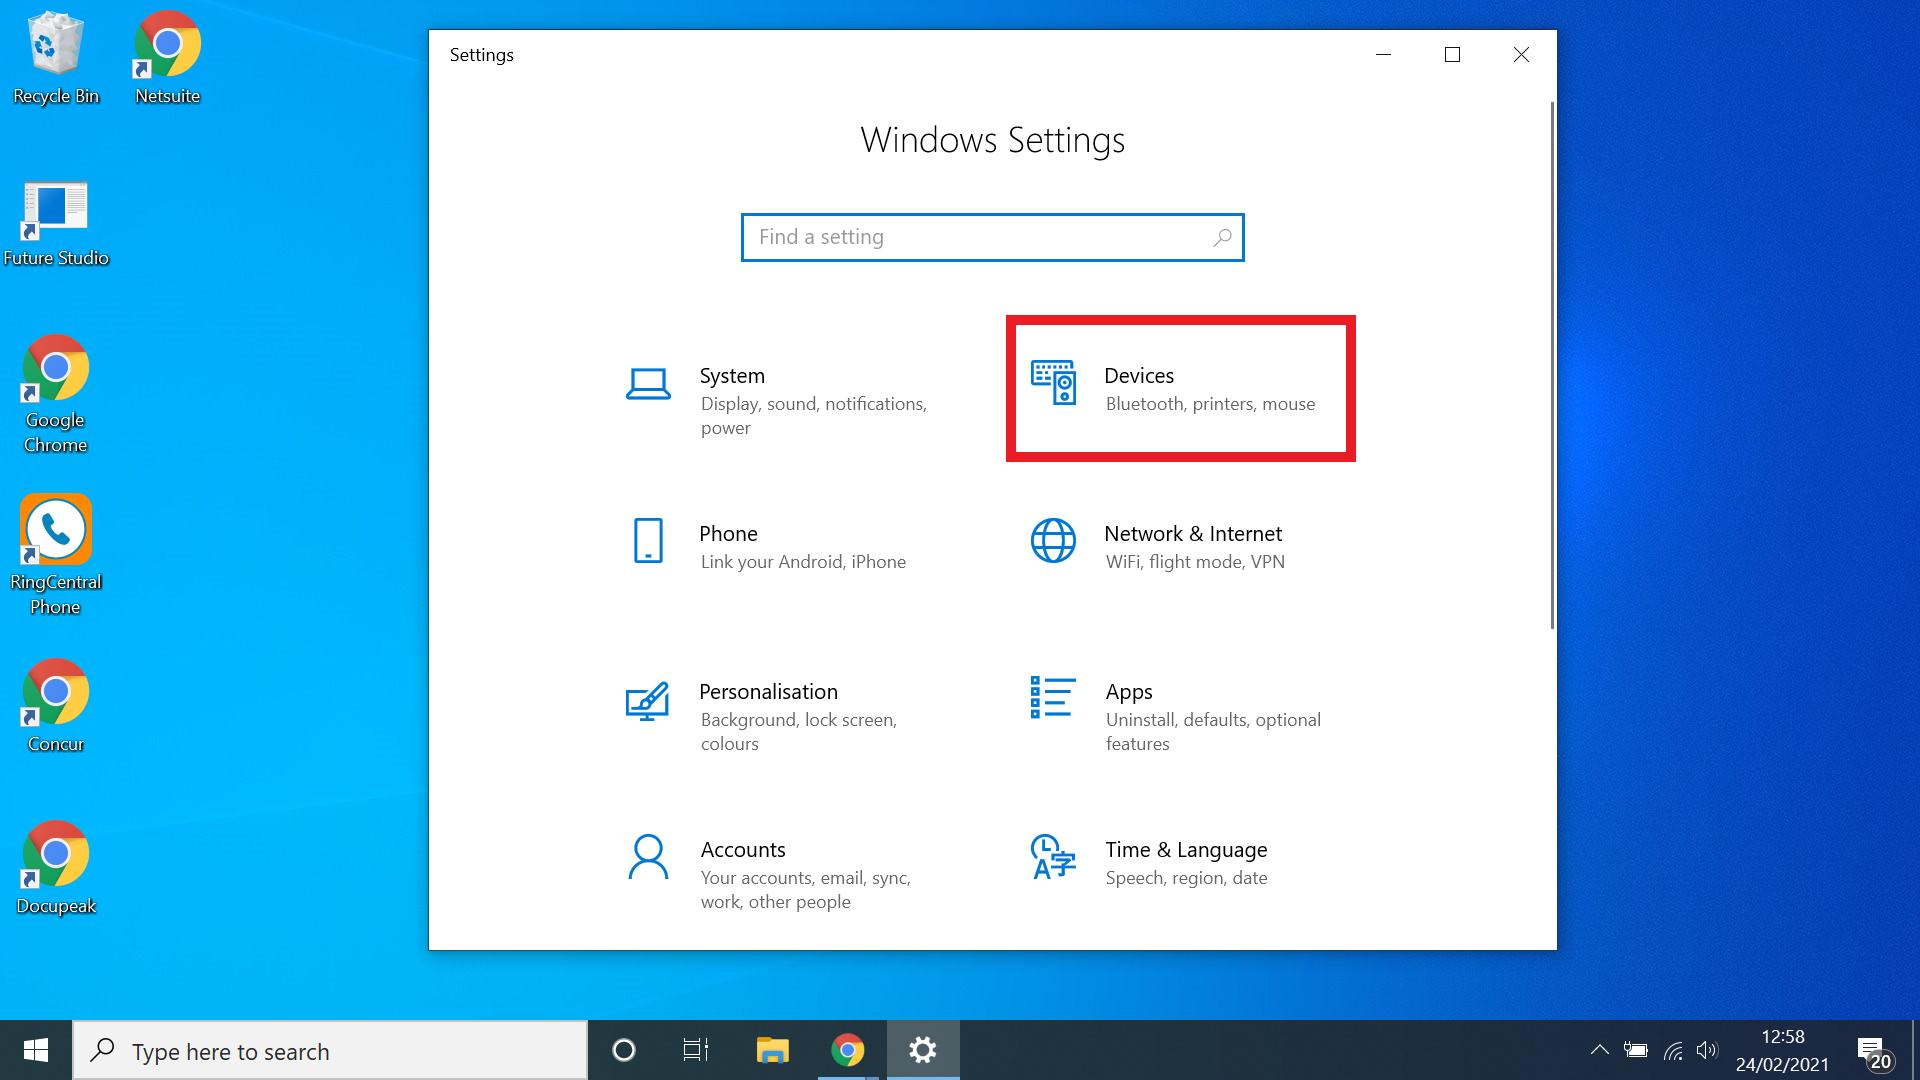 cara mengaktifkan bluetooth untuk windows 10 - pilih perangkat